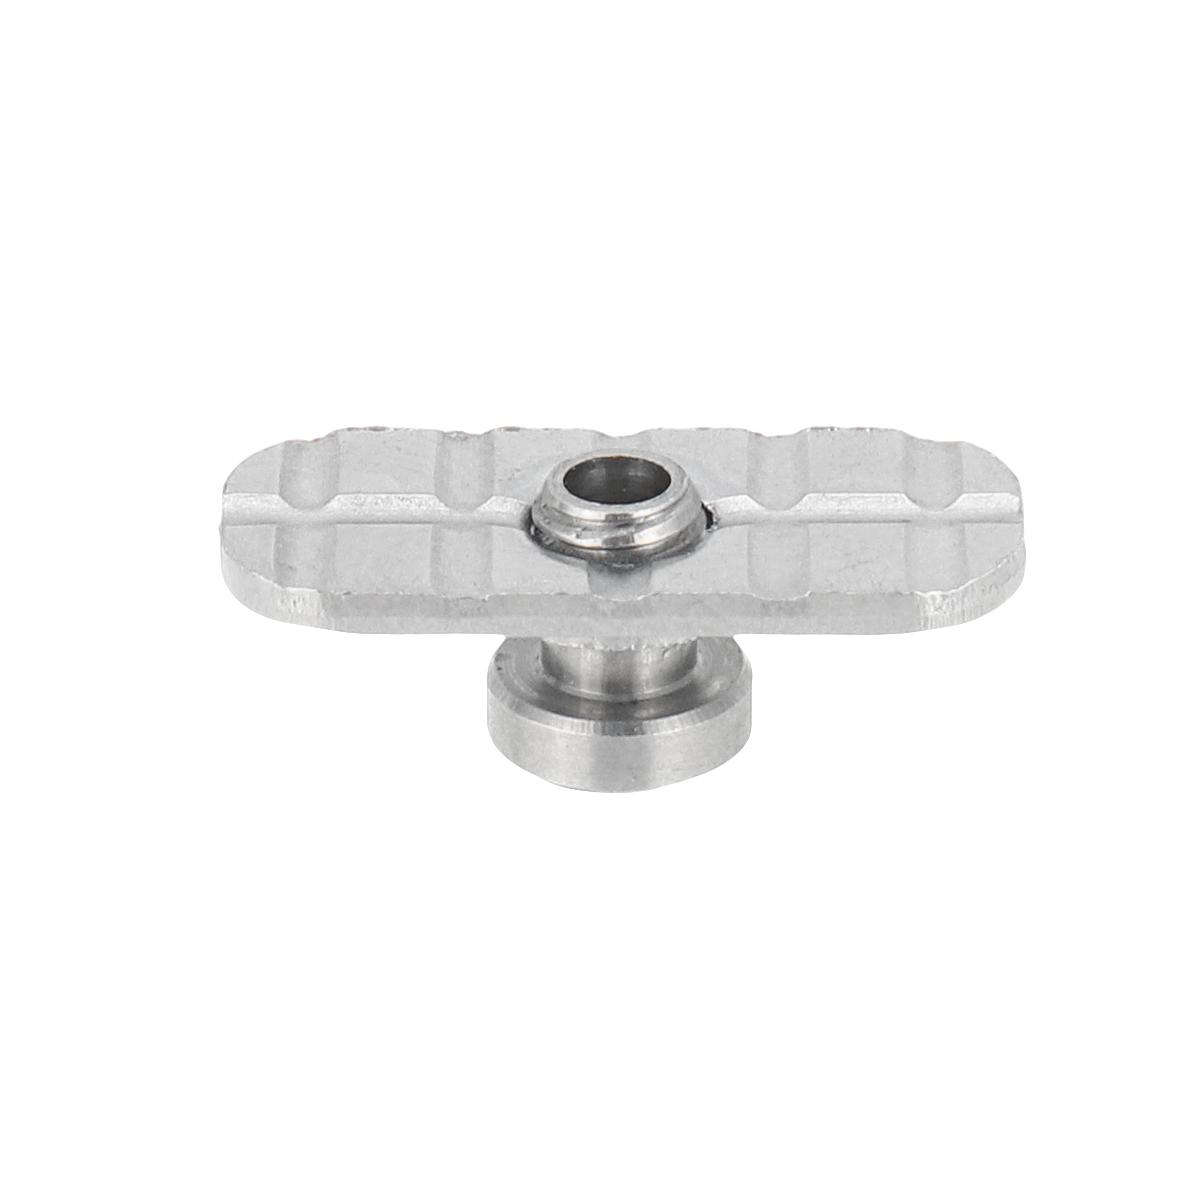 Stainless Steel Adjustable 3D Sandwich Pusher For PAX 2 & PAX 3 3D Sandwich Push